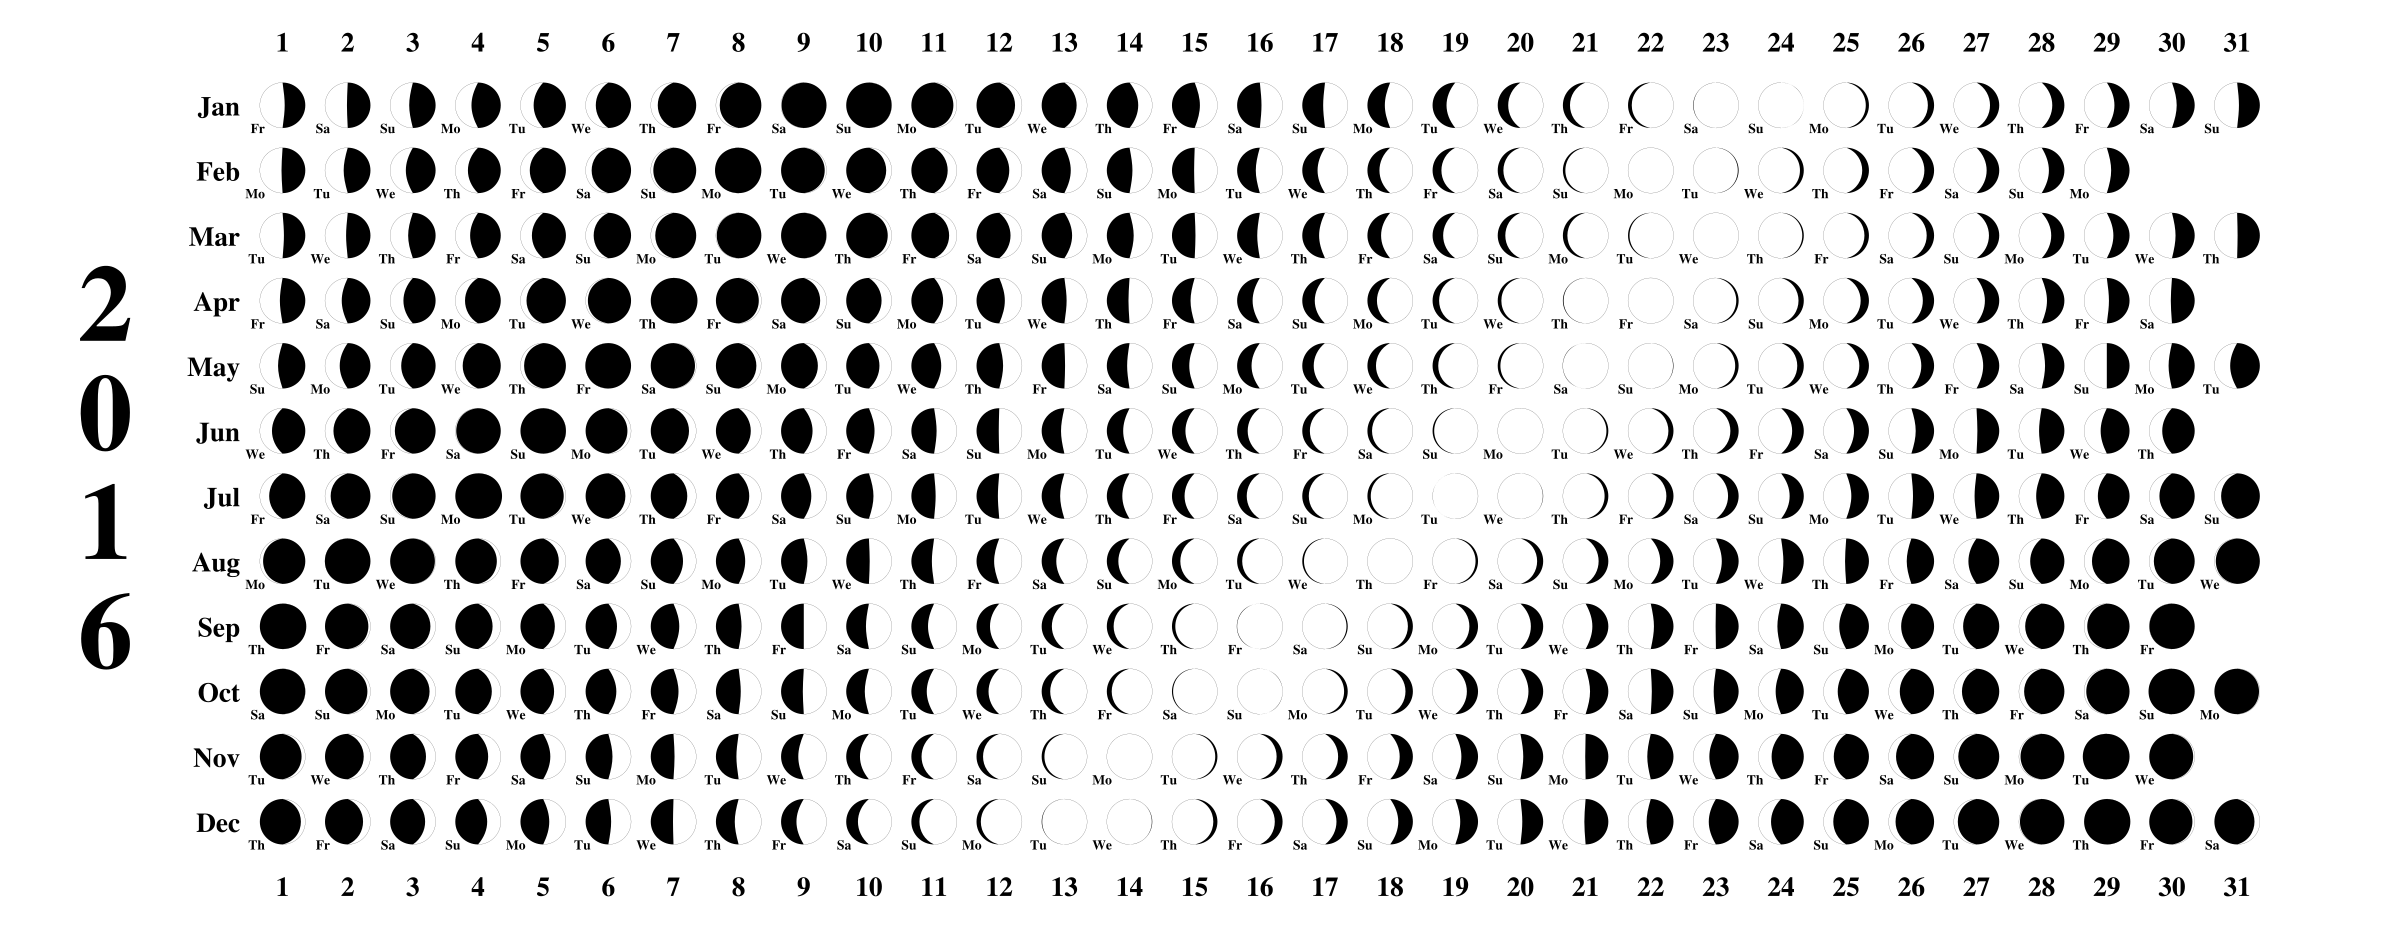 Moon Phases Calendar 2016, moon schedule calendar 2016, moon schedule 2016 Yearly calendar, moon schedule 2016 Yearly calendar